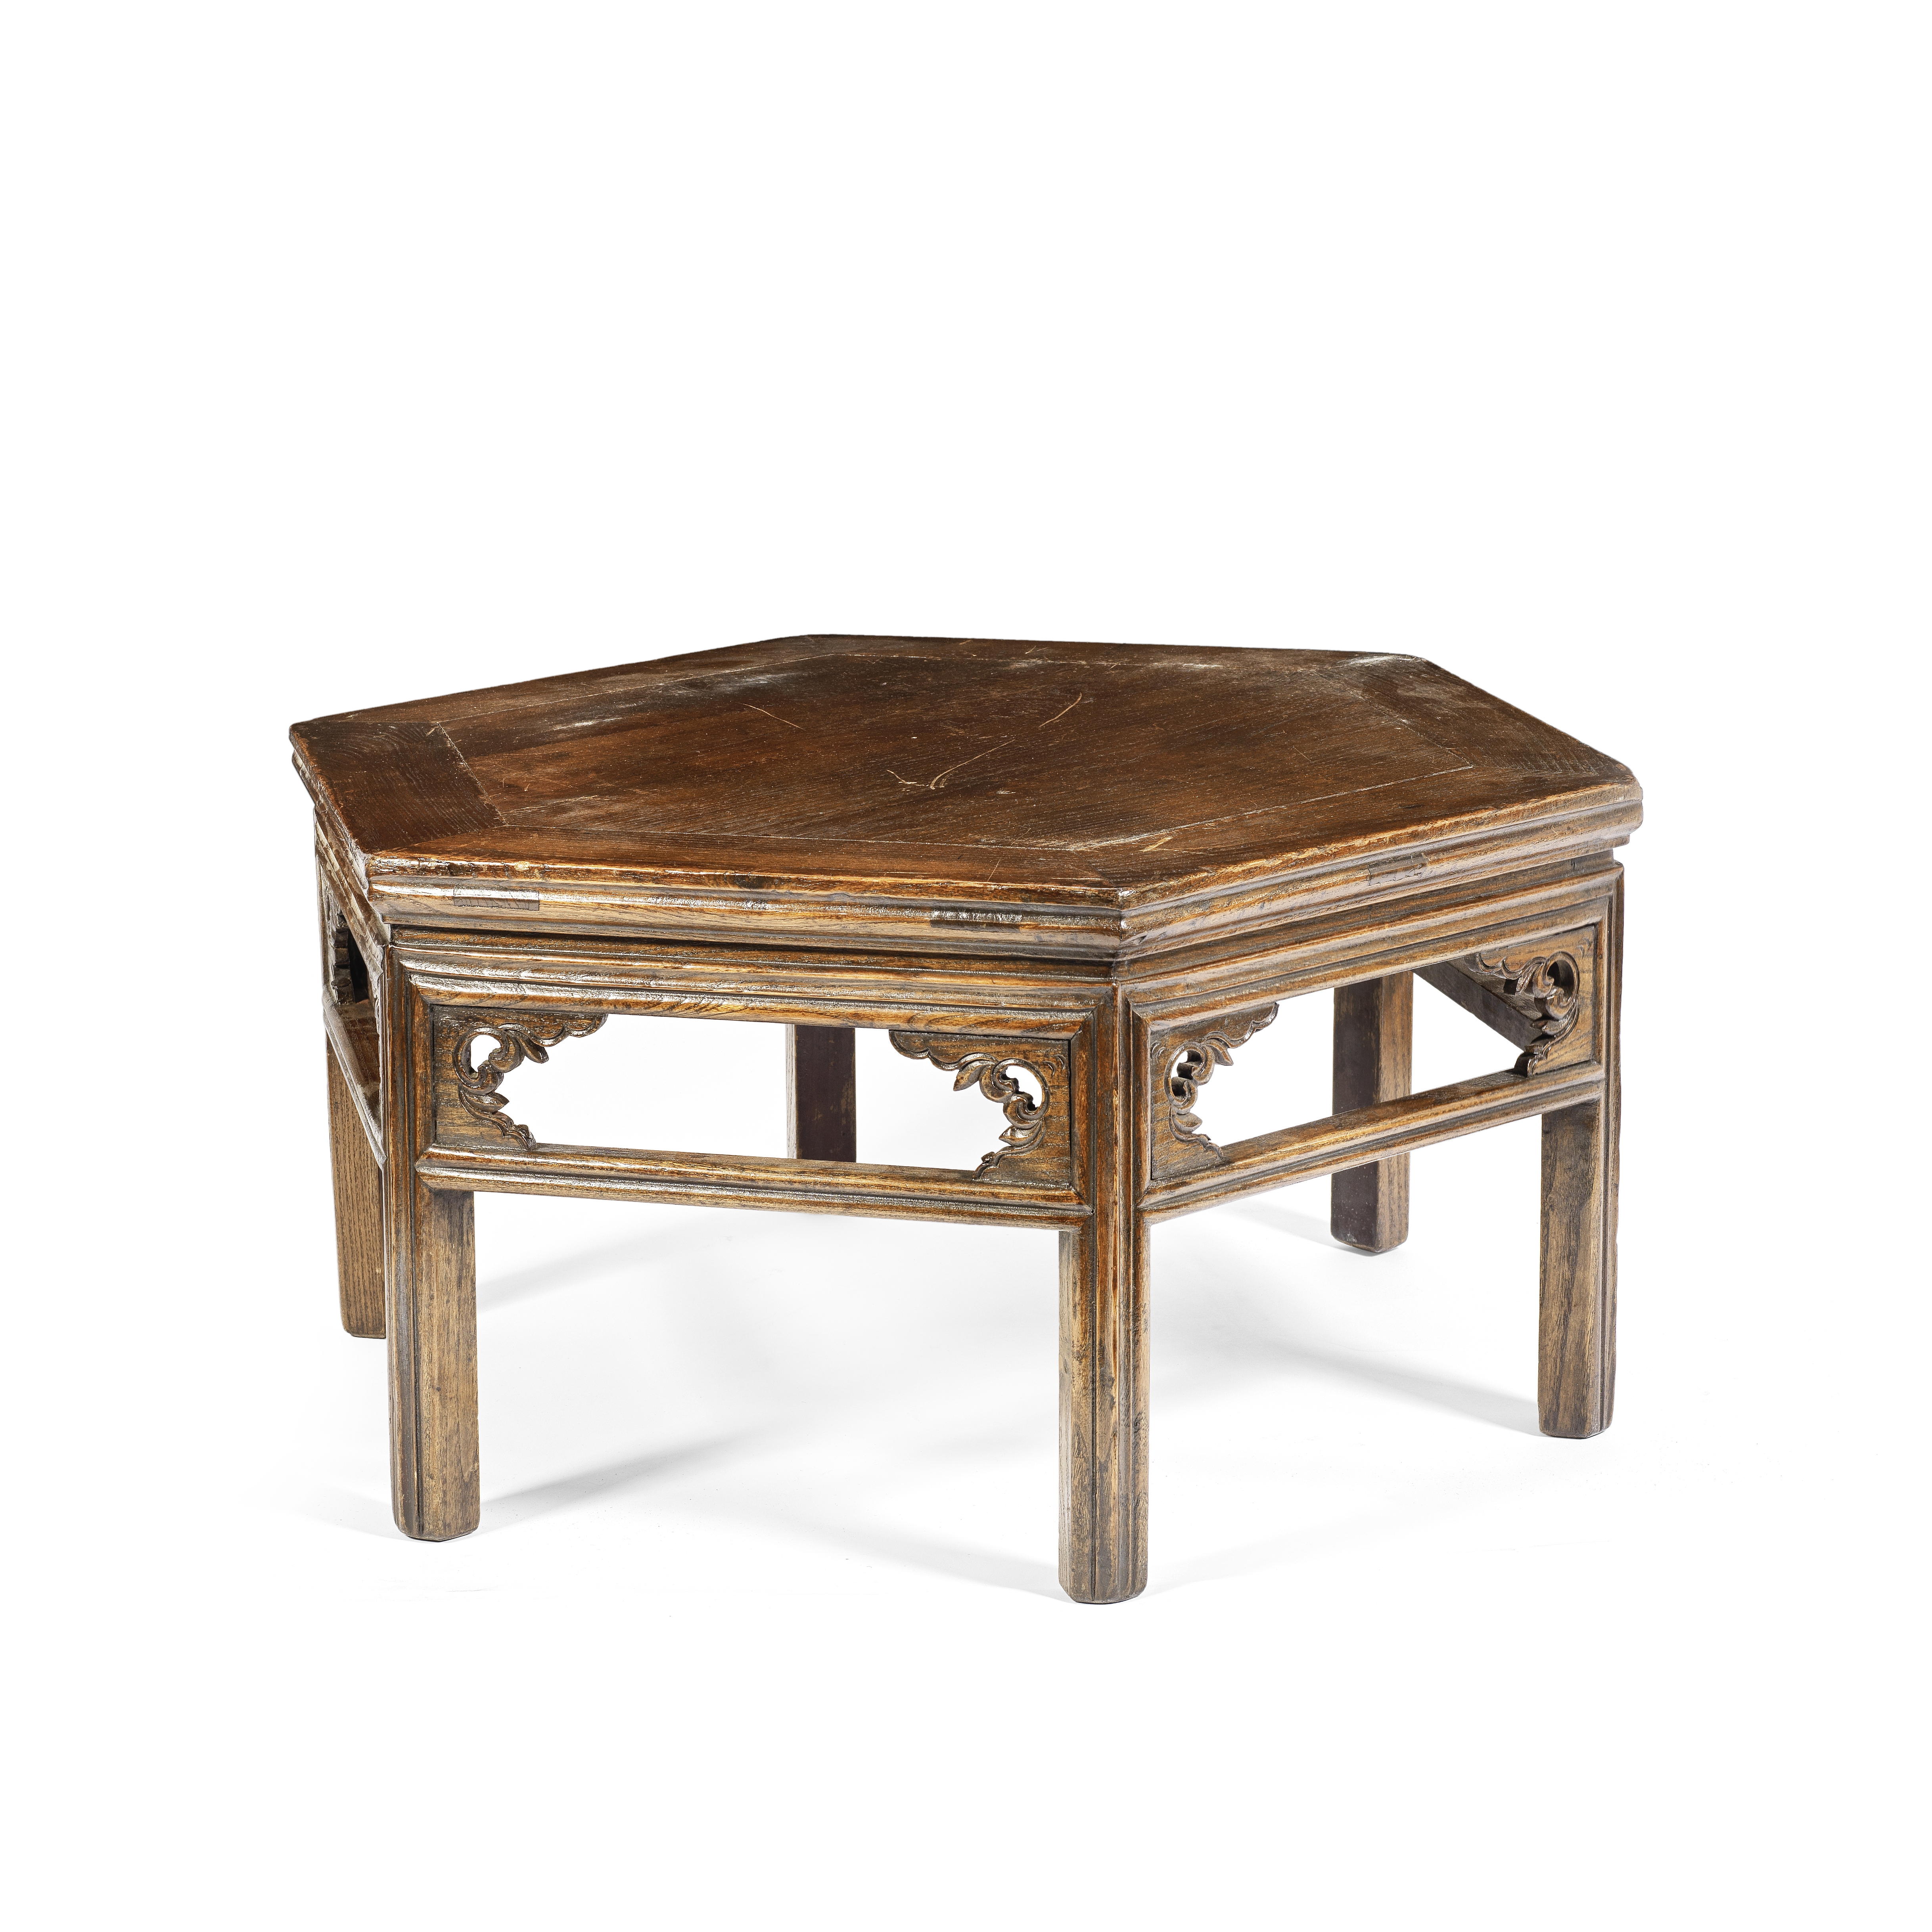 A HEXAGONAL ELMWOOD LOW TABLE 19th century